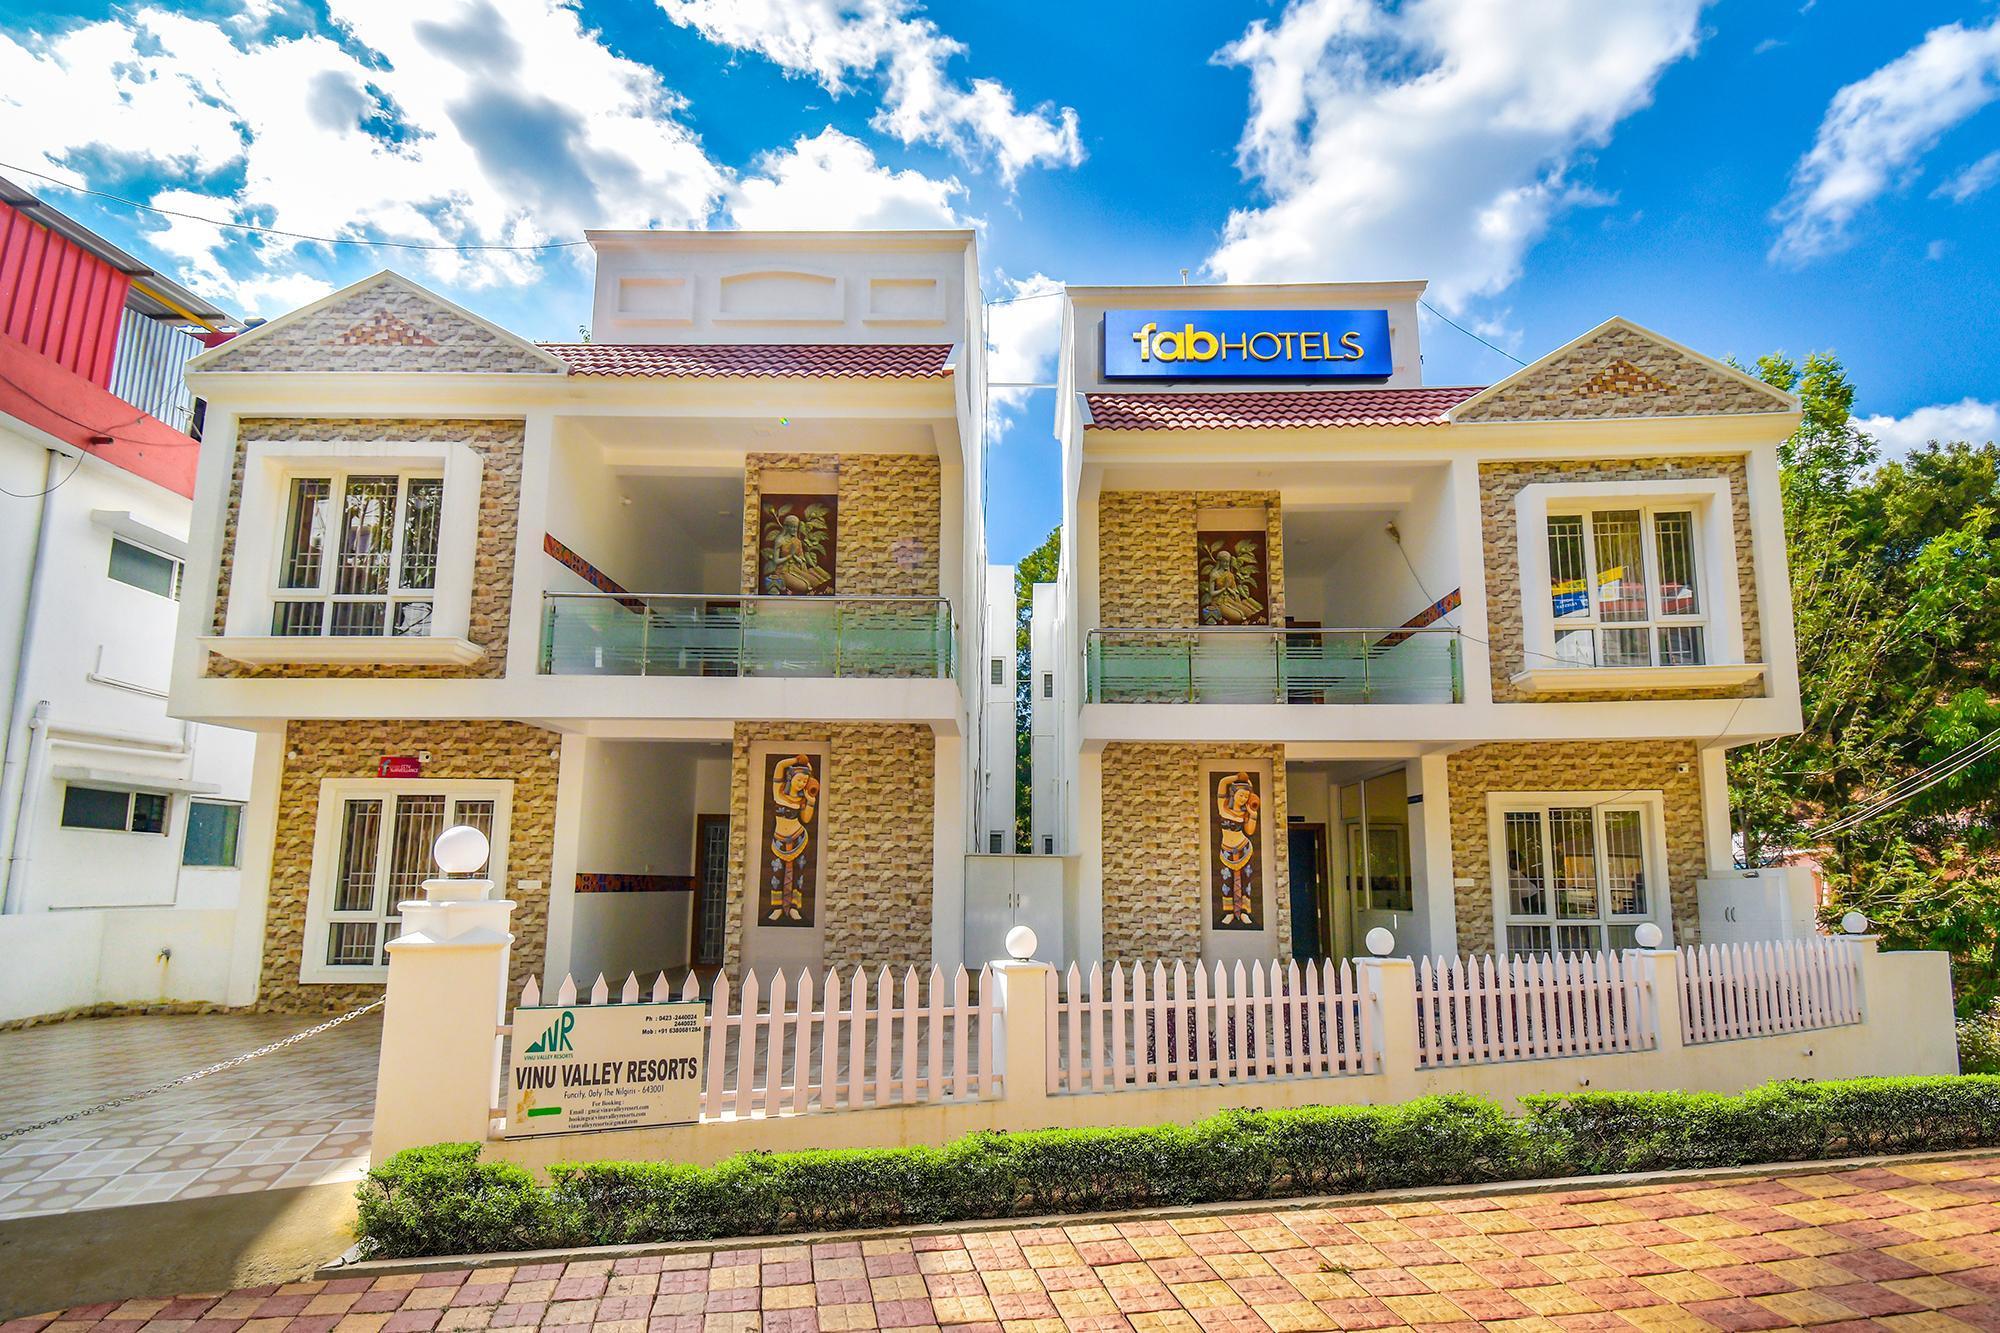 FabHotel Vinu Valley Resort Funcity